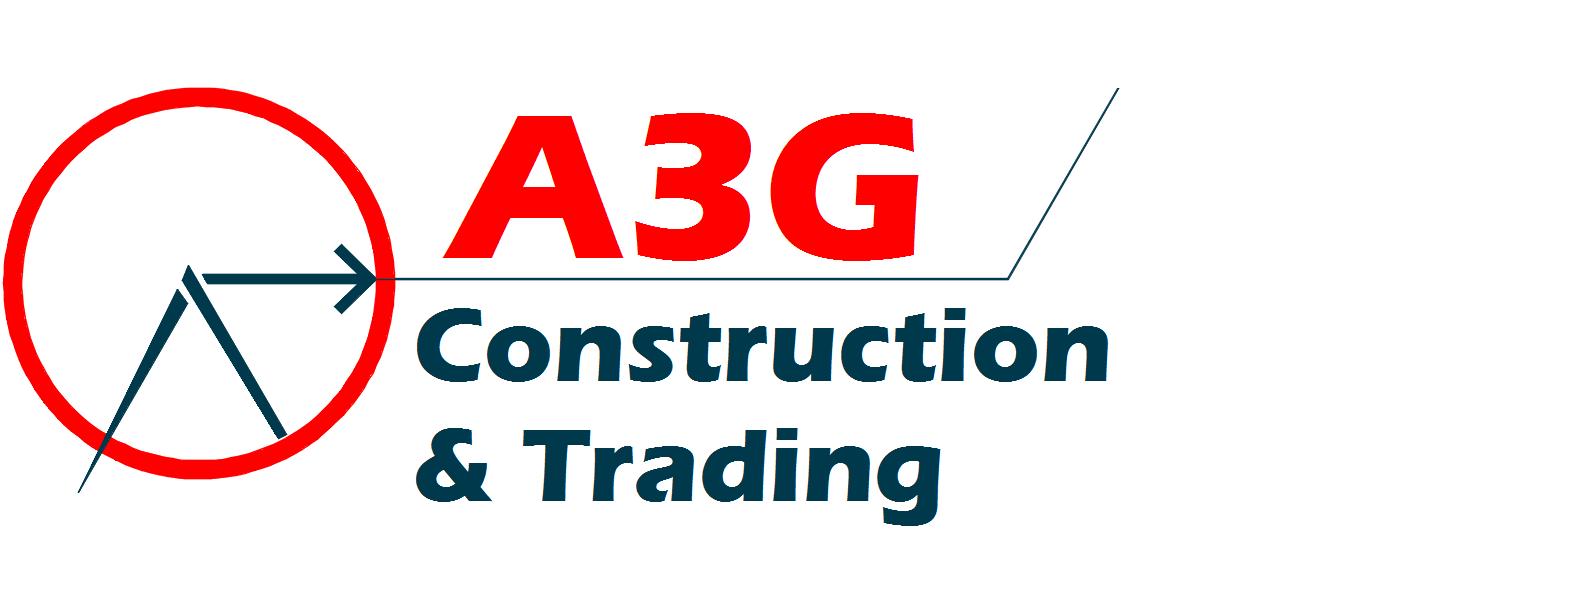 A3G Construction